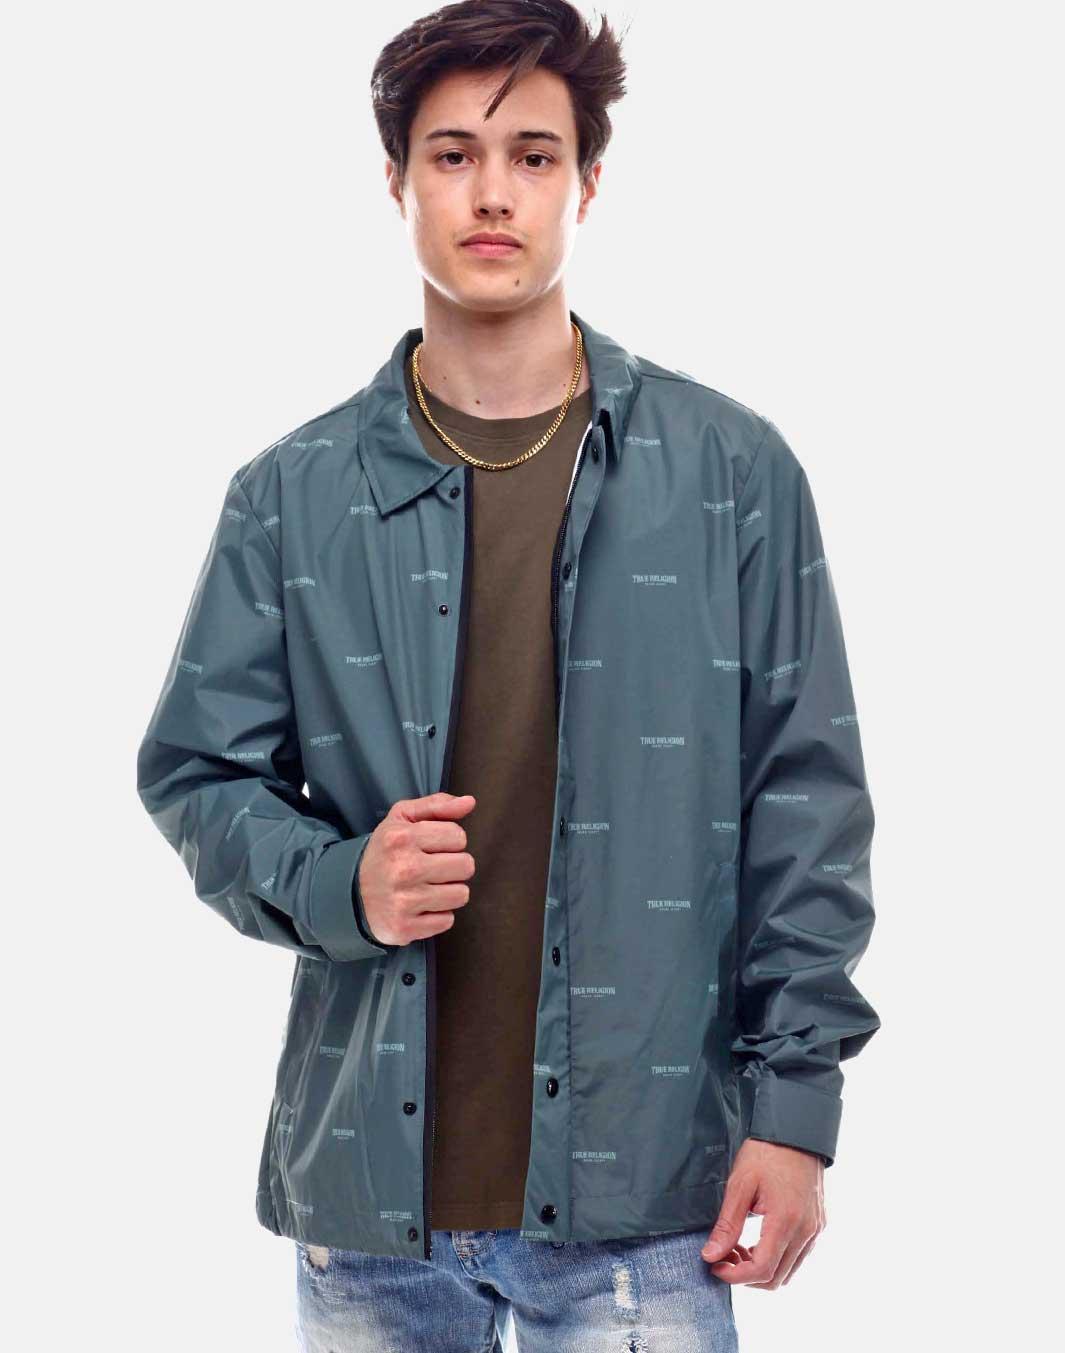 Shop Outerwear at DrJays.com